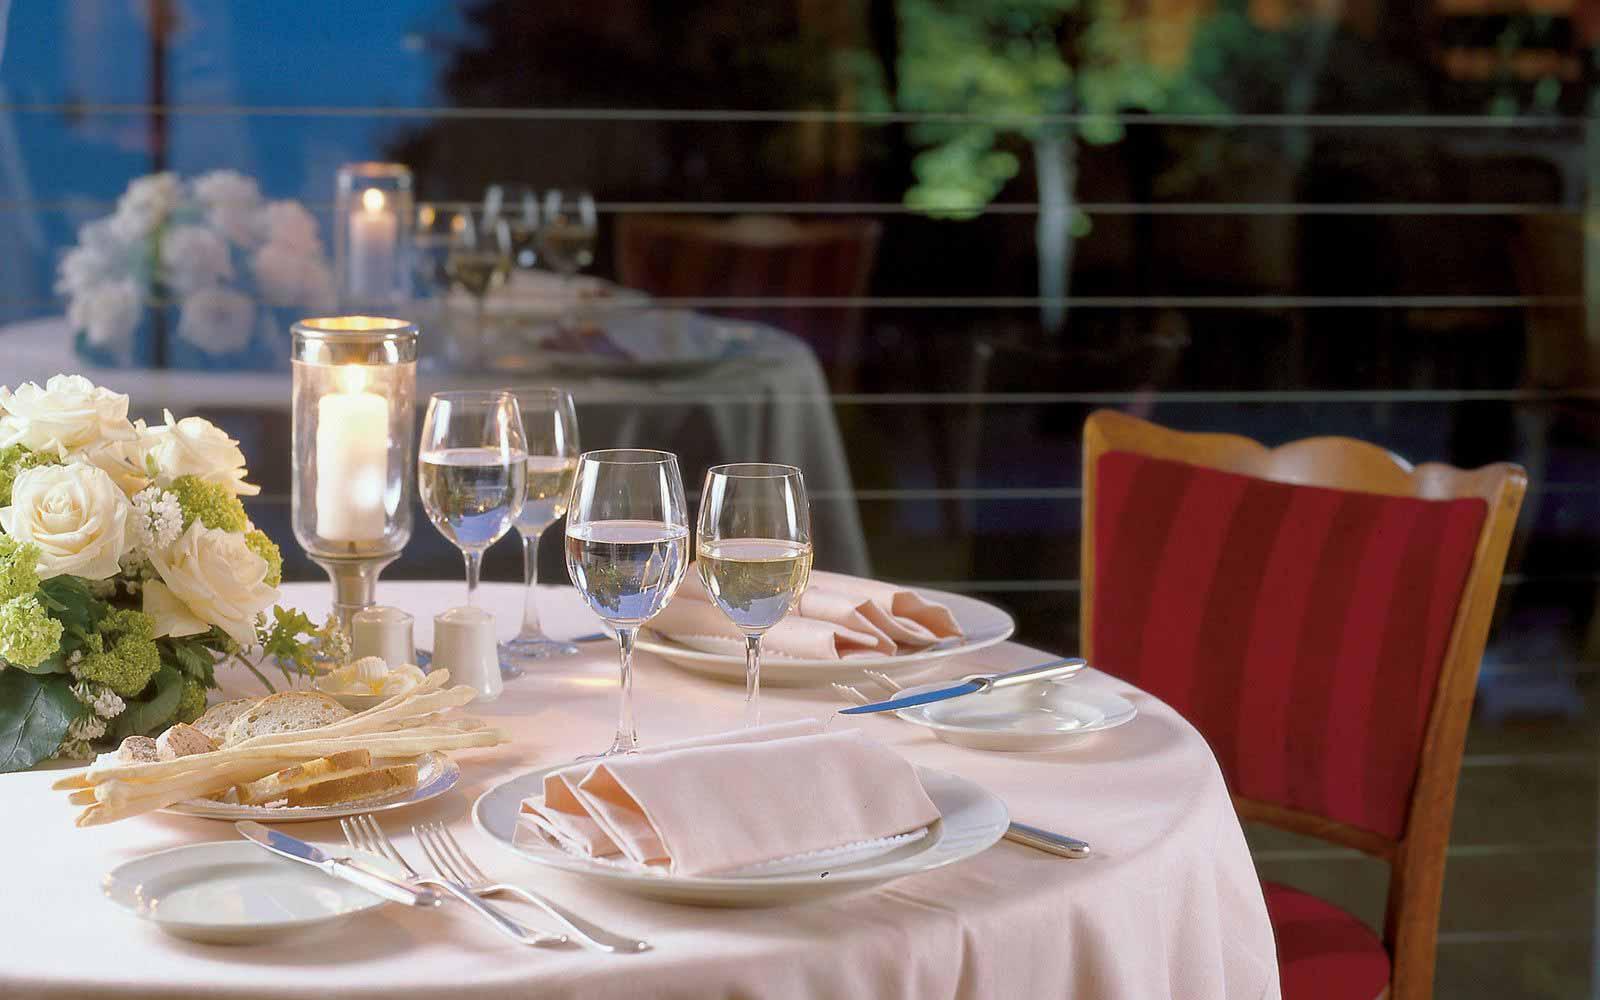 Romantic dinner at Grand Hotel Majestic